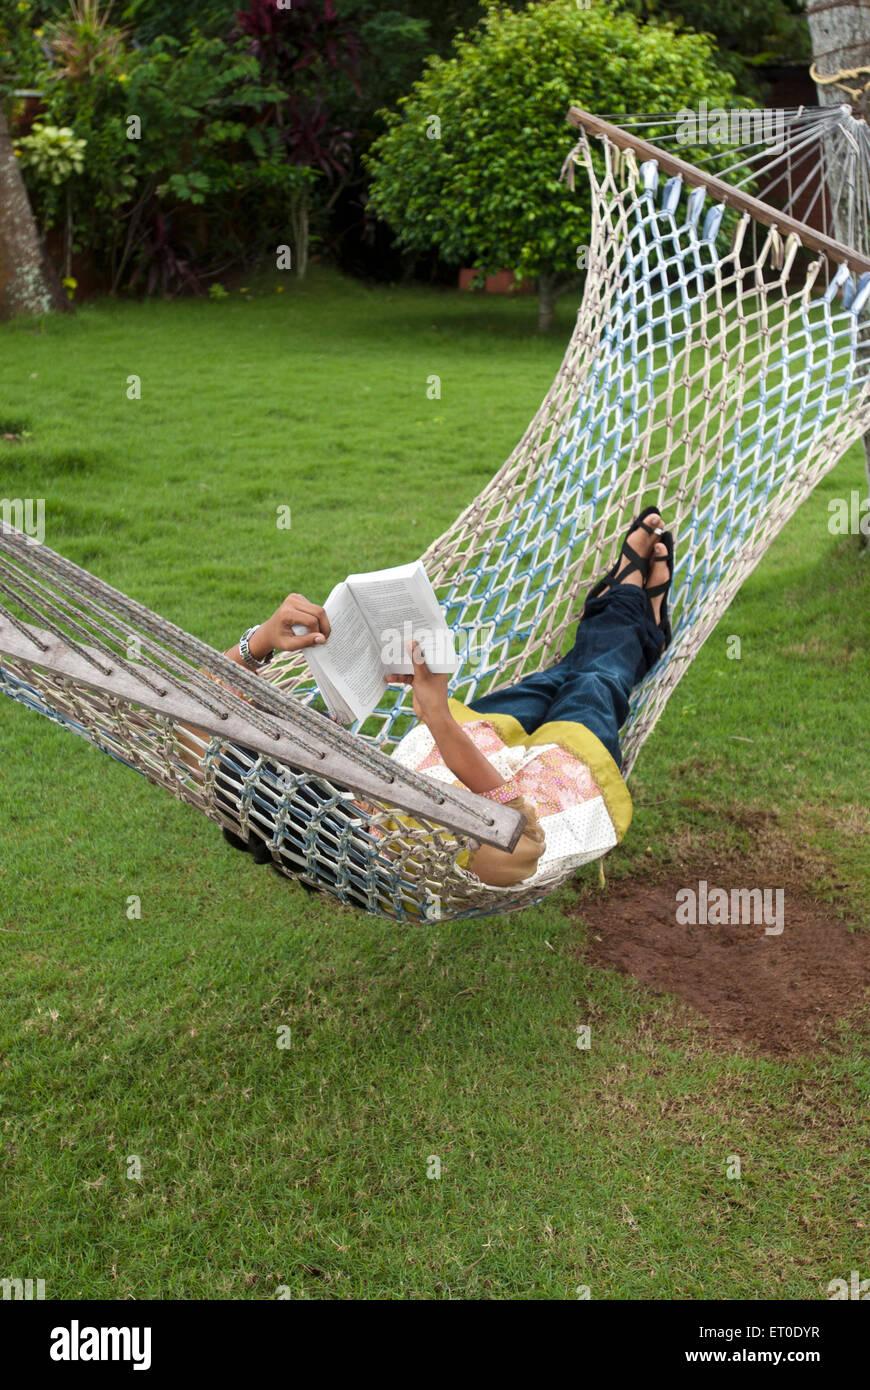 Woman reading book resting in hammock in heritage lake resort ; Kuttanad ; Alleppey Alappuzha ; Kerala ; India MR#777L - Stock Image